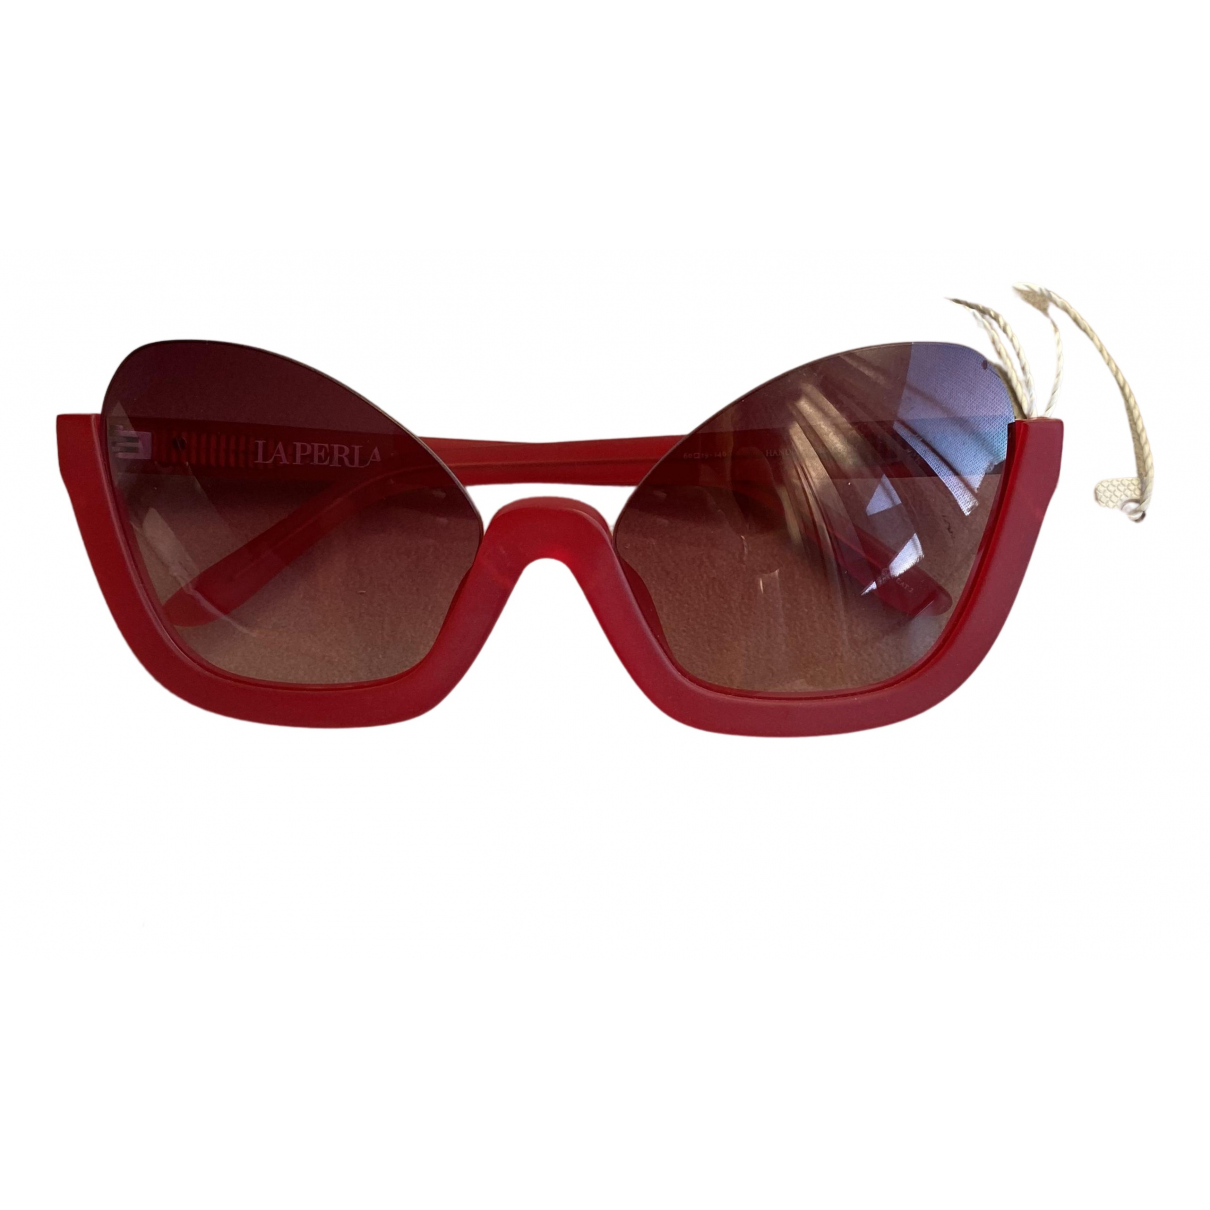 La Perla \N Sonnenbrillen in Kunststoff